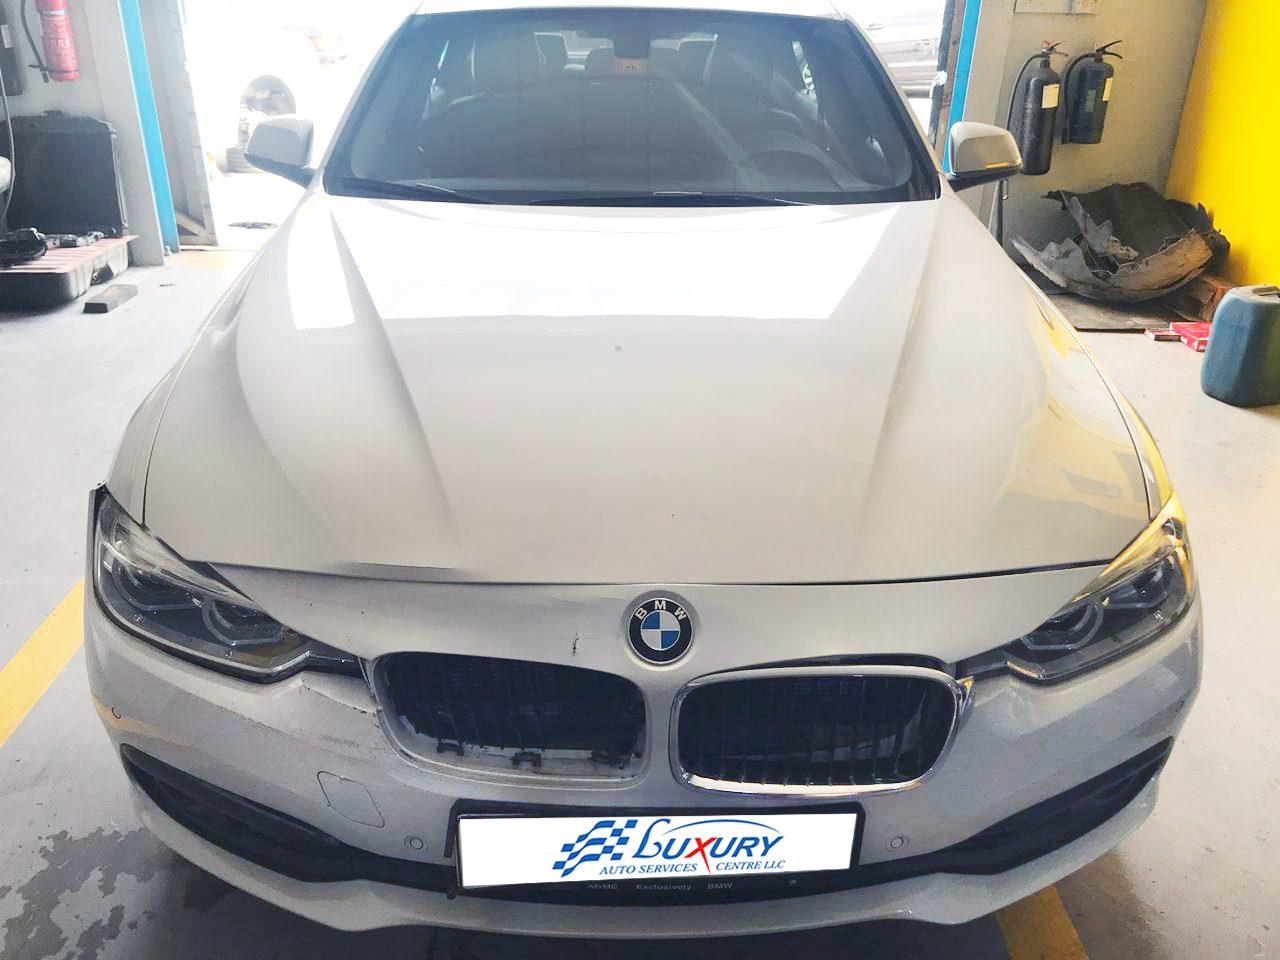 Bmw 318i Front Accident Repair Luxury Auto Service Dubai